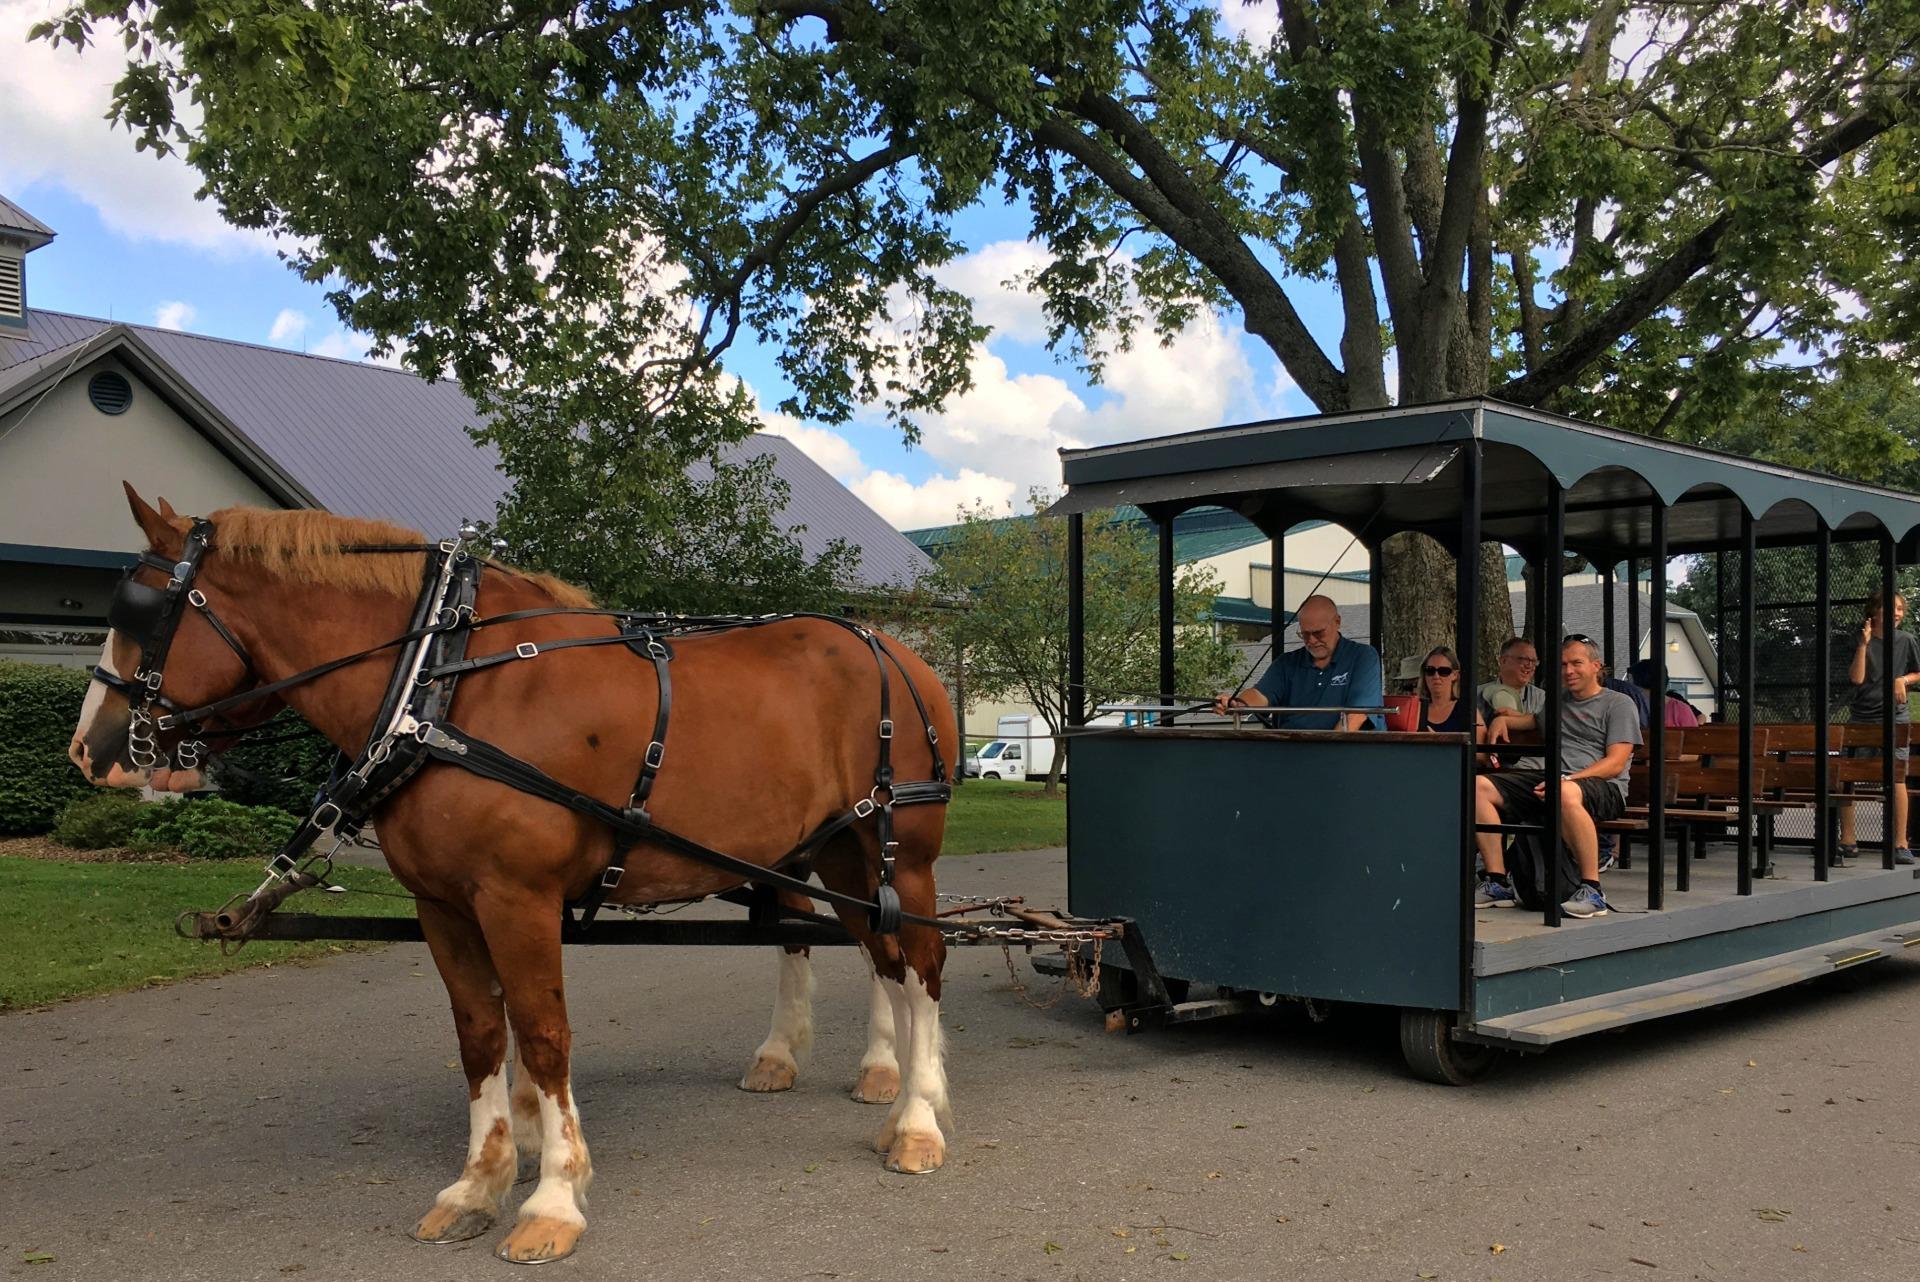 Wagon ride at the Kentucky Horse Park